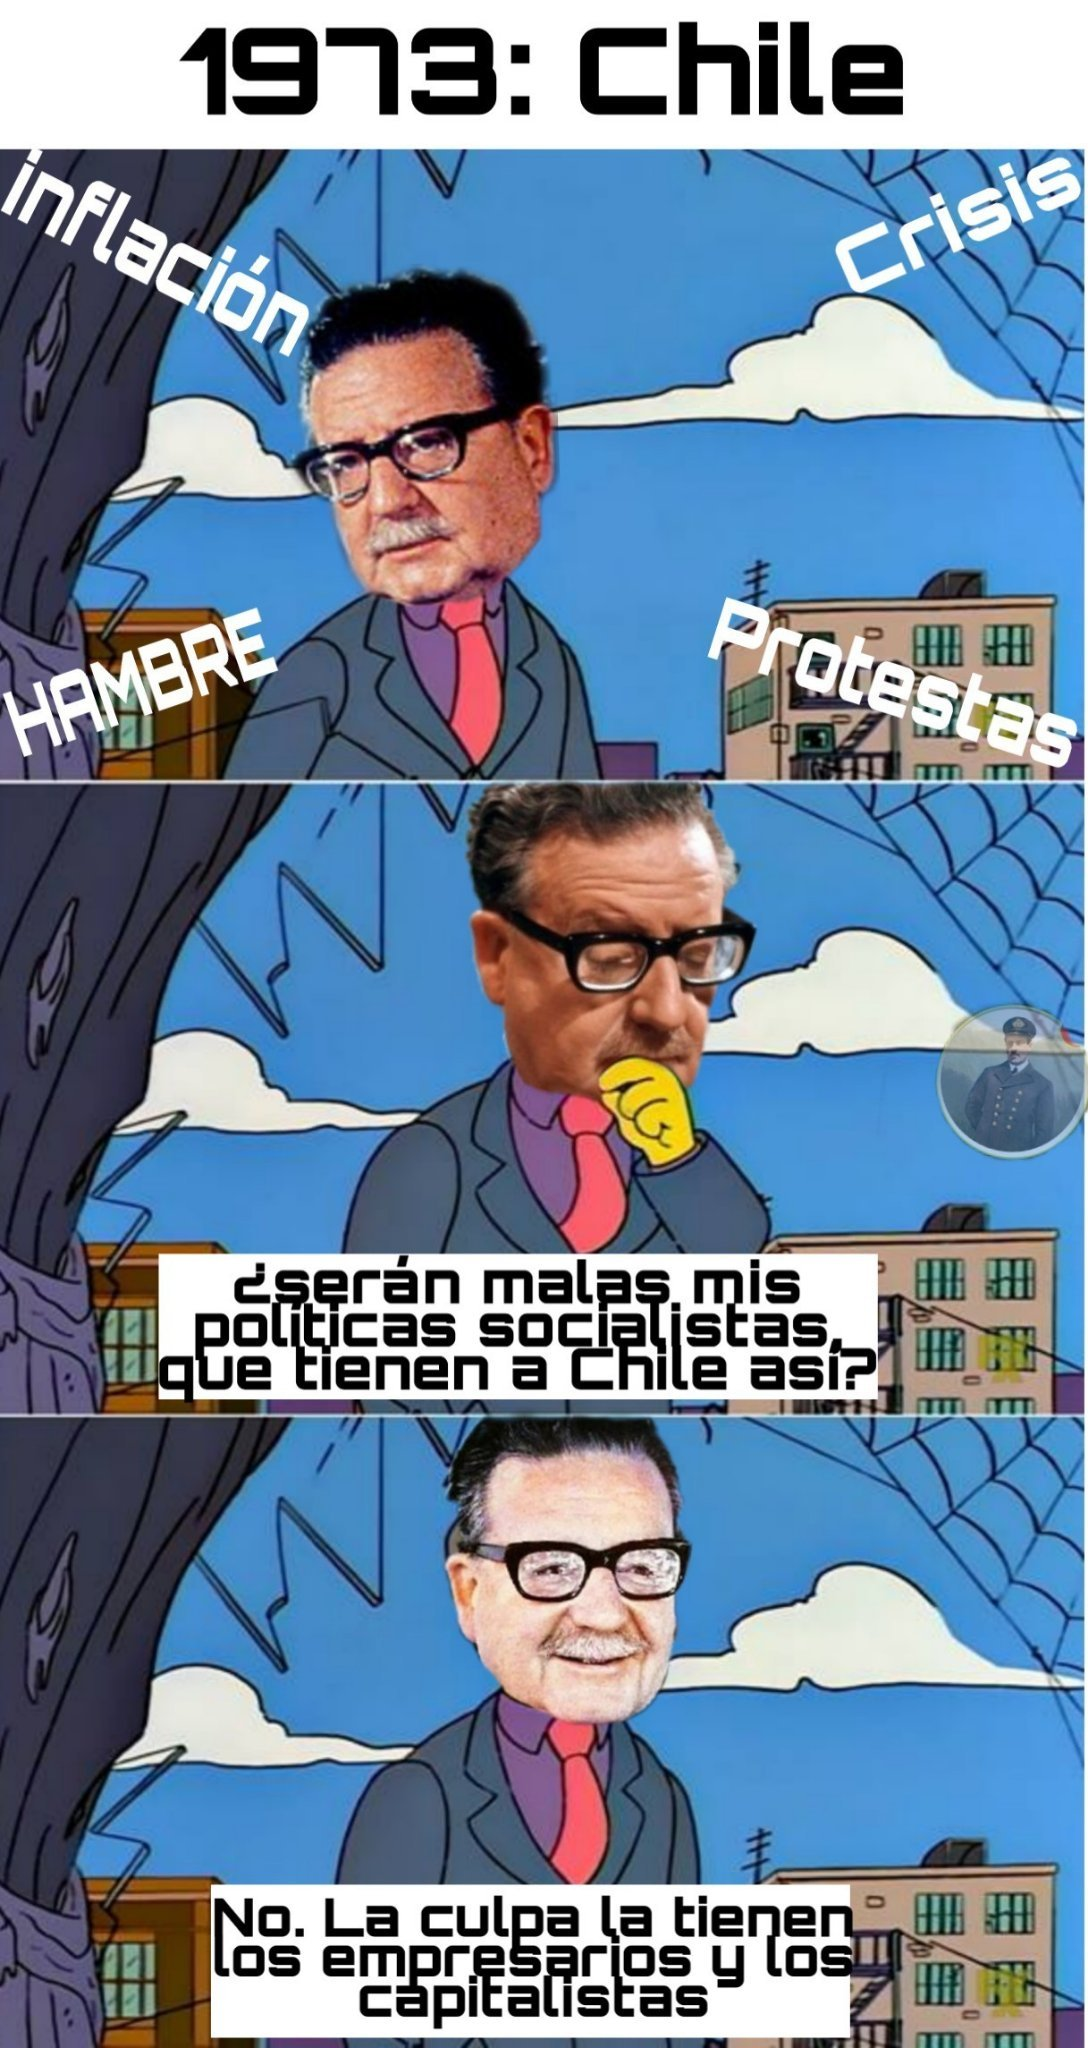 Antes que ocurriera lo de Pinochet - meme